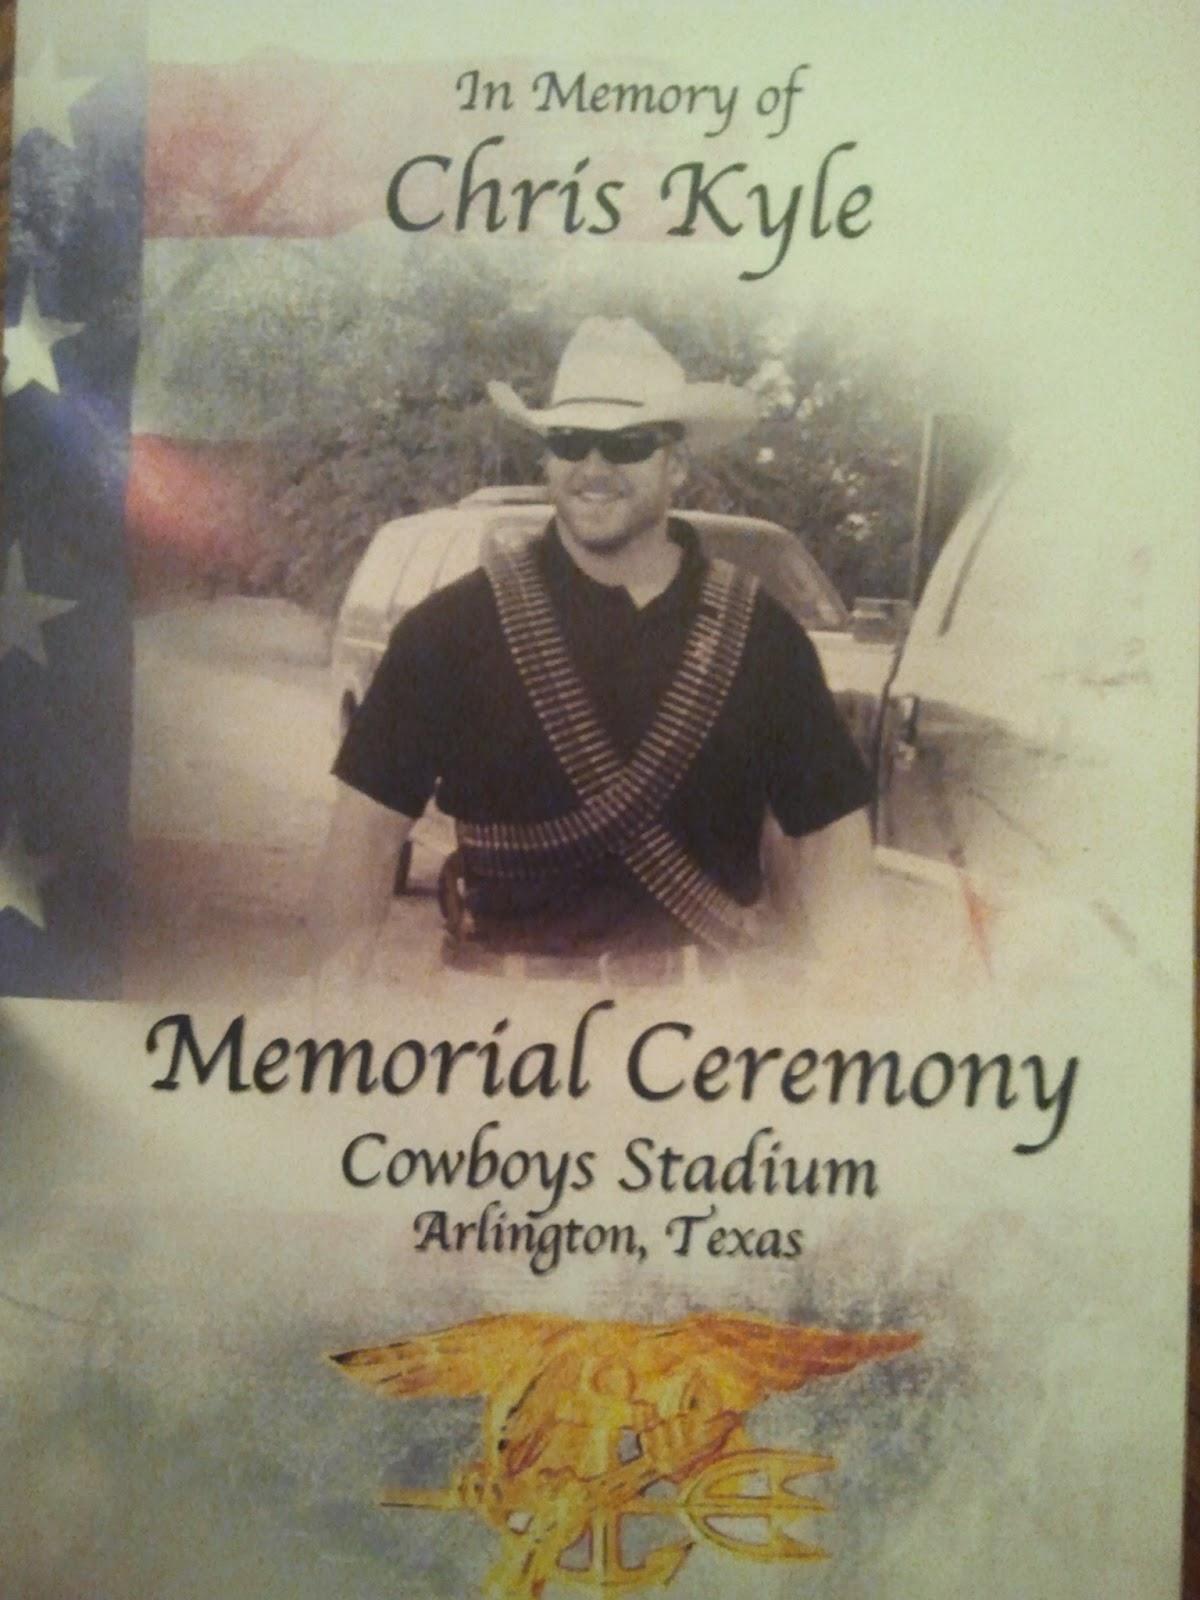 Perfection Under A Red Umbrella Chris Kyle Memorial